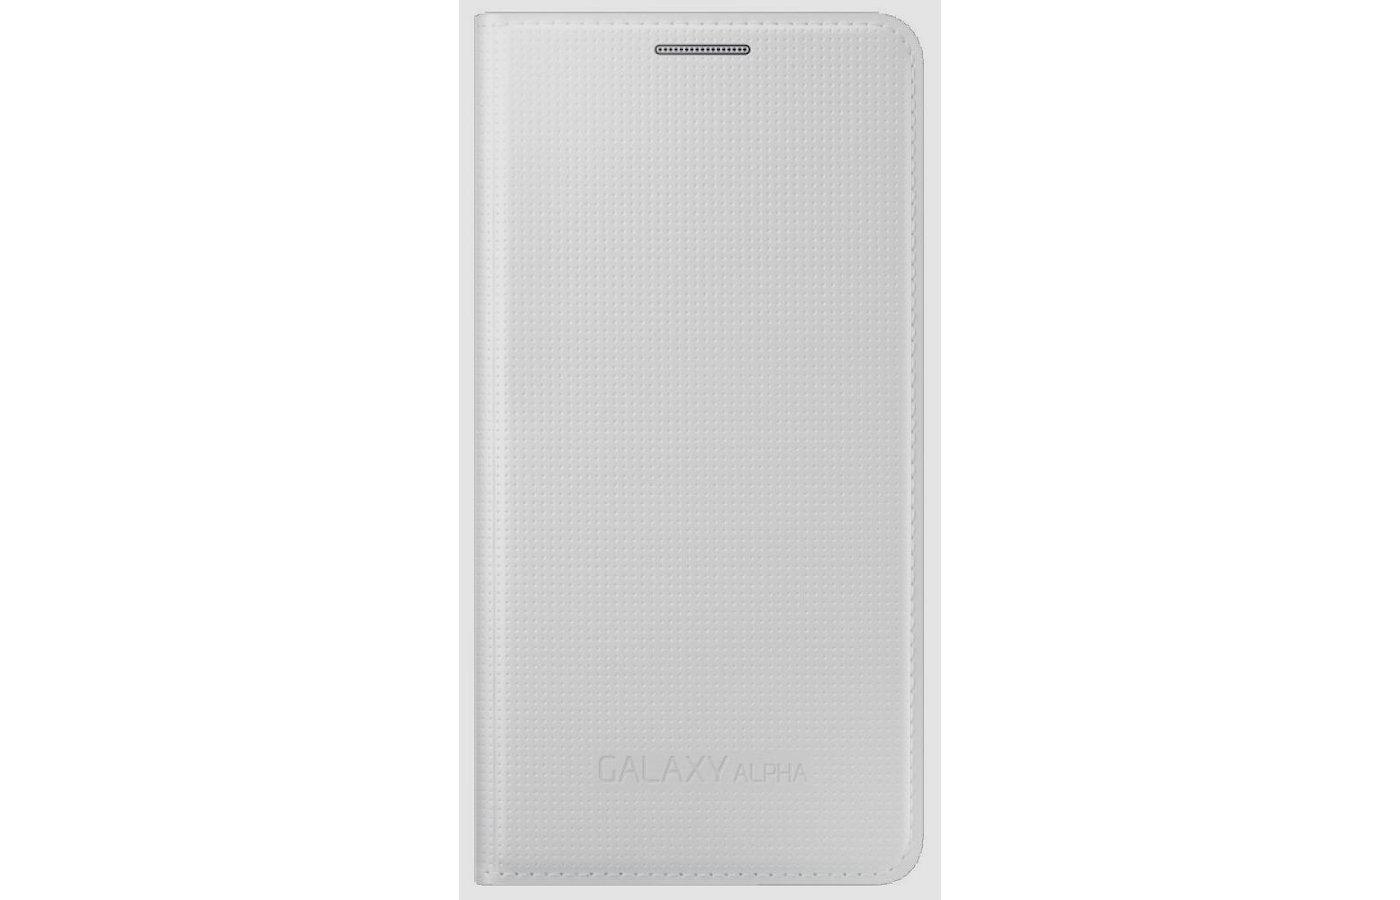 Чехол Samsung Flip Cover для Galaxy Alpha (SM-G850) (EF-FG850BWEGRU) белый